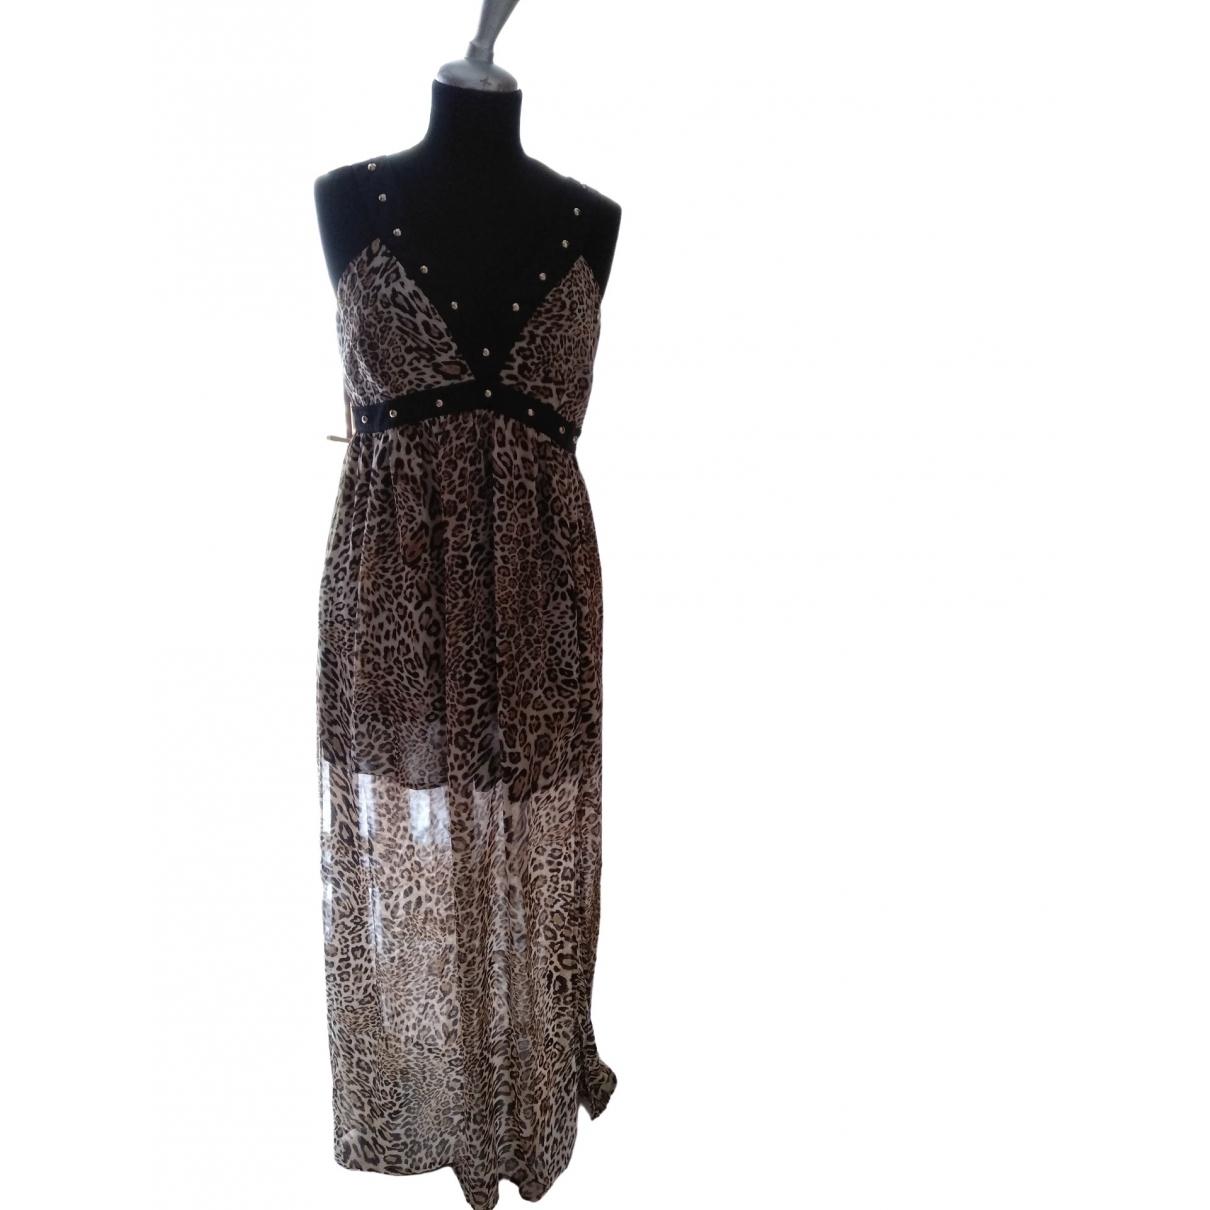 Guess \N dress for Women L International